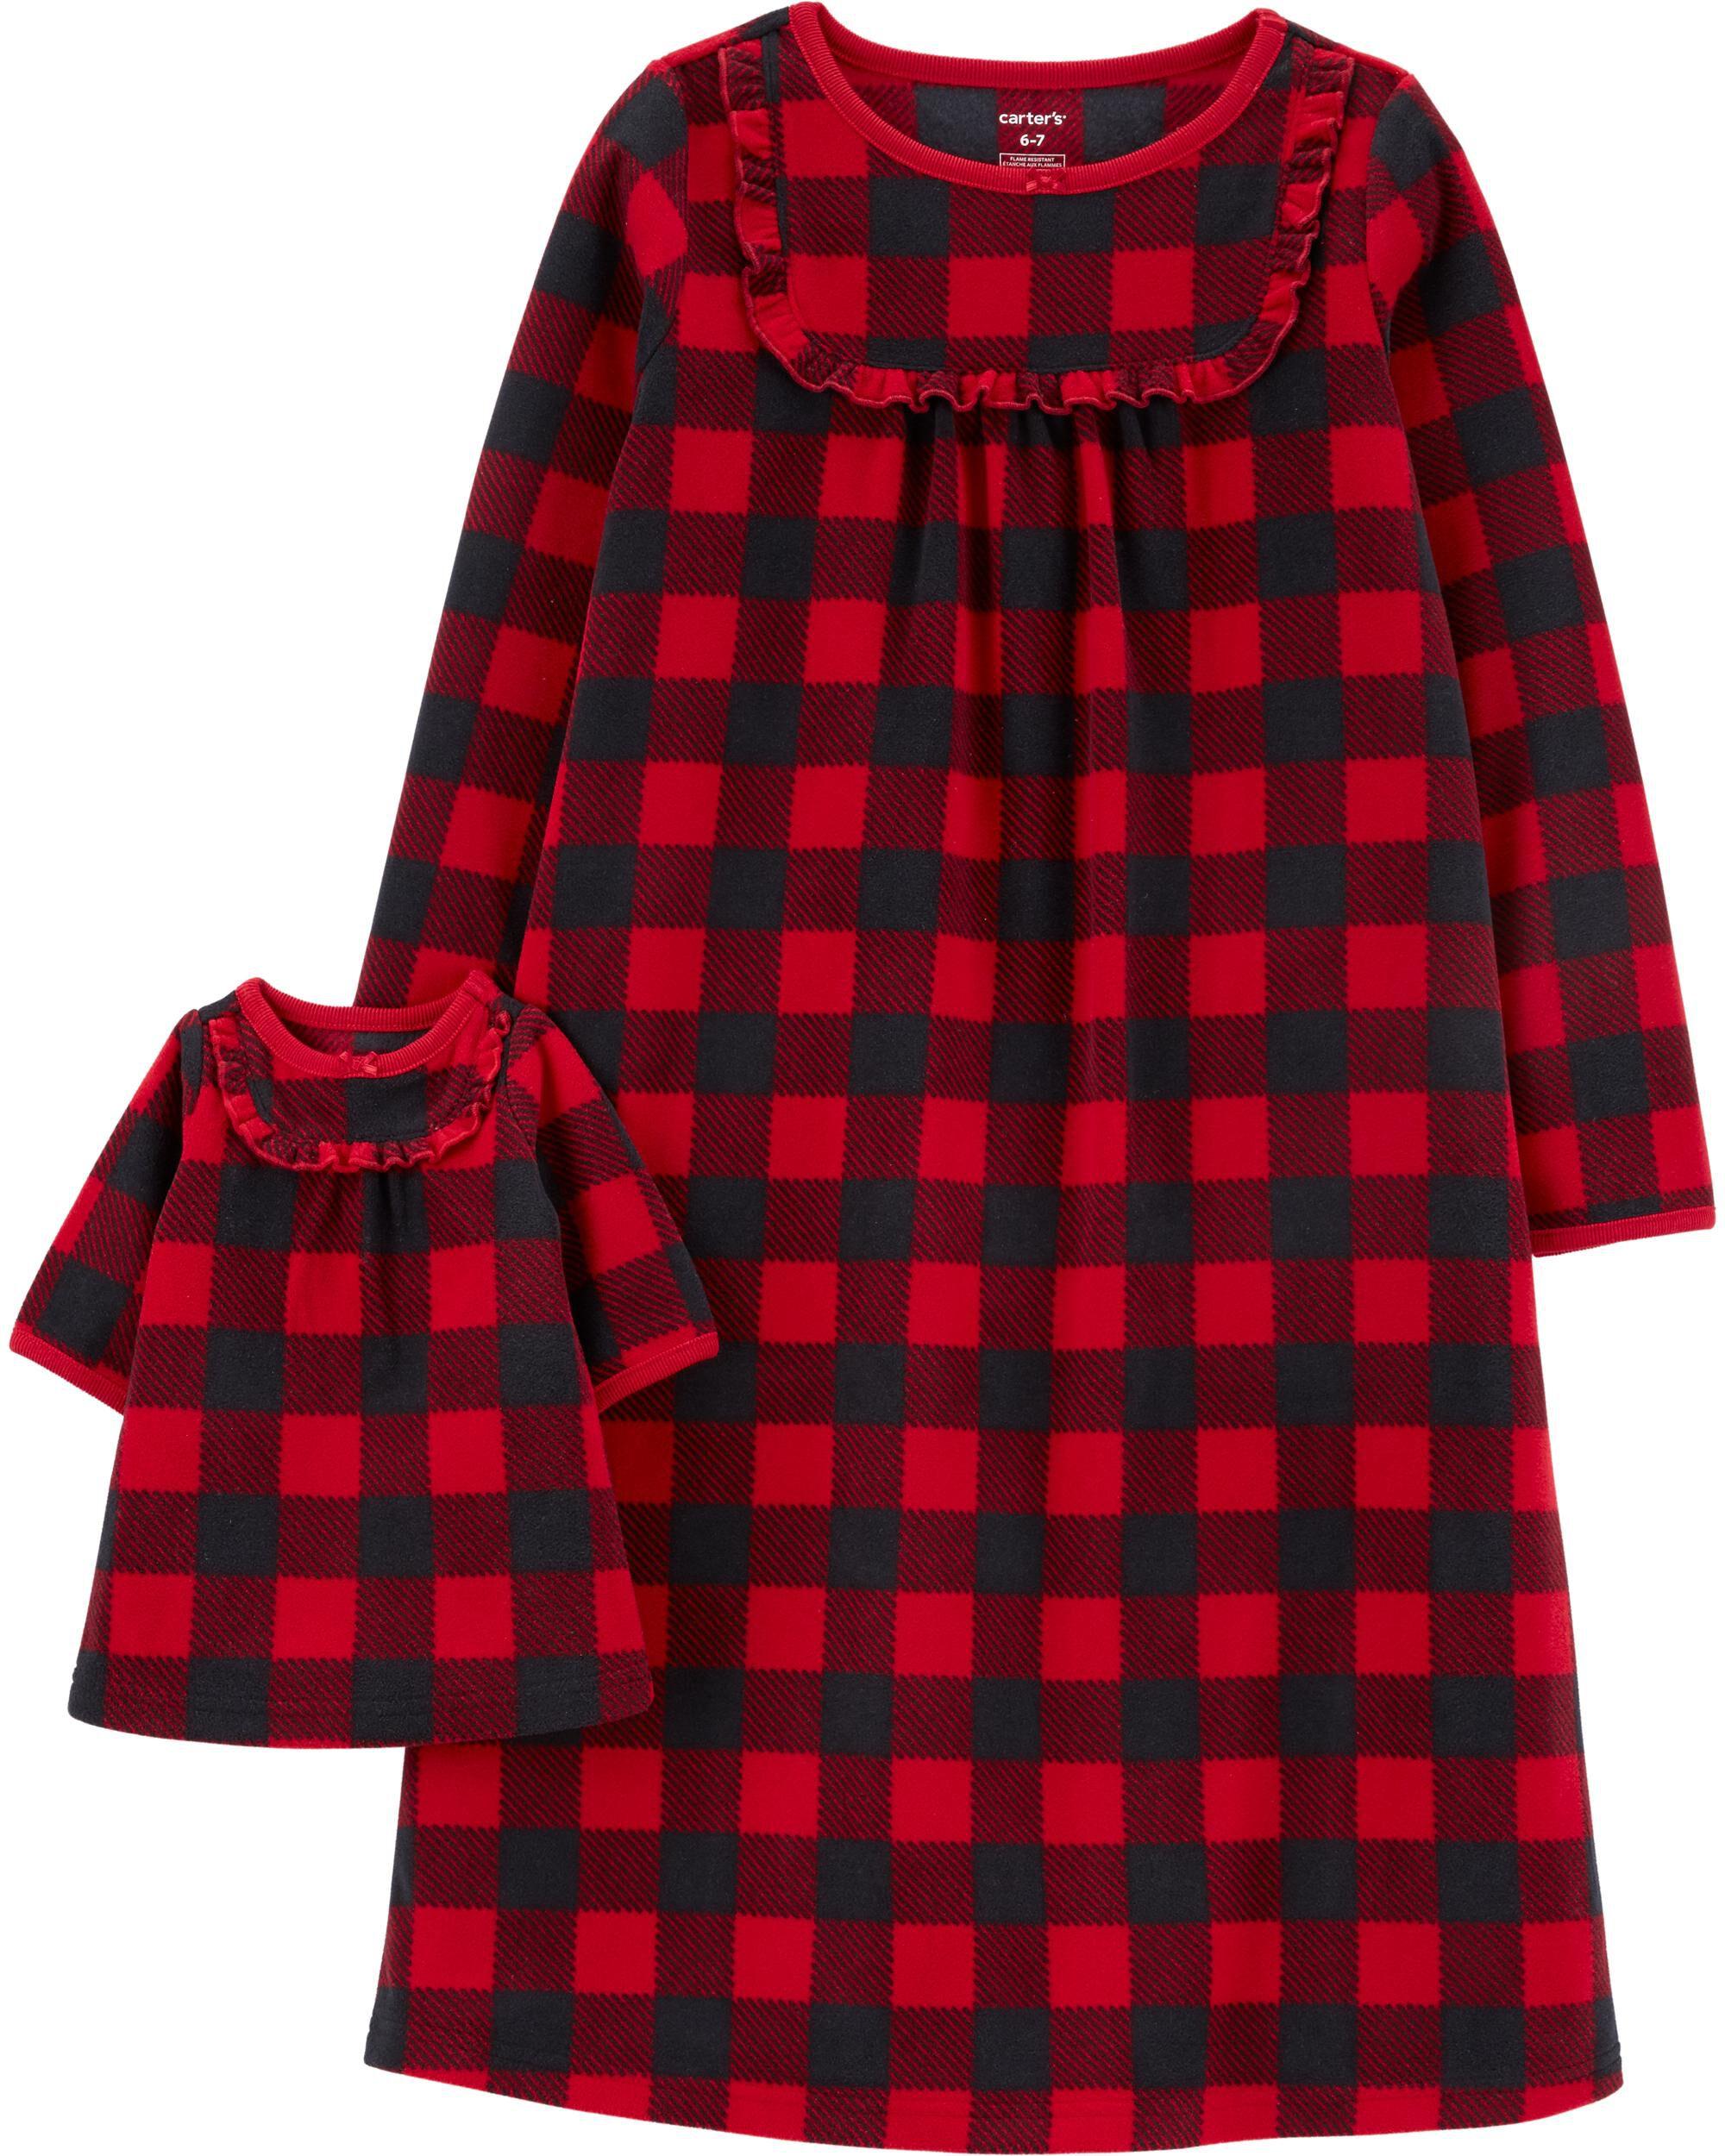 Buffalo Check Matching Nightgown & Doll Nightgown Set